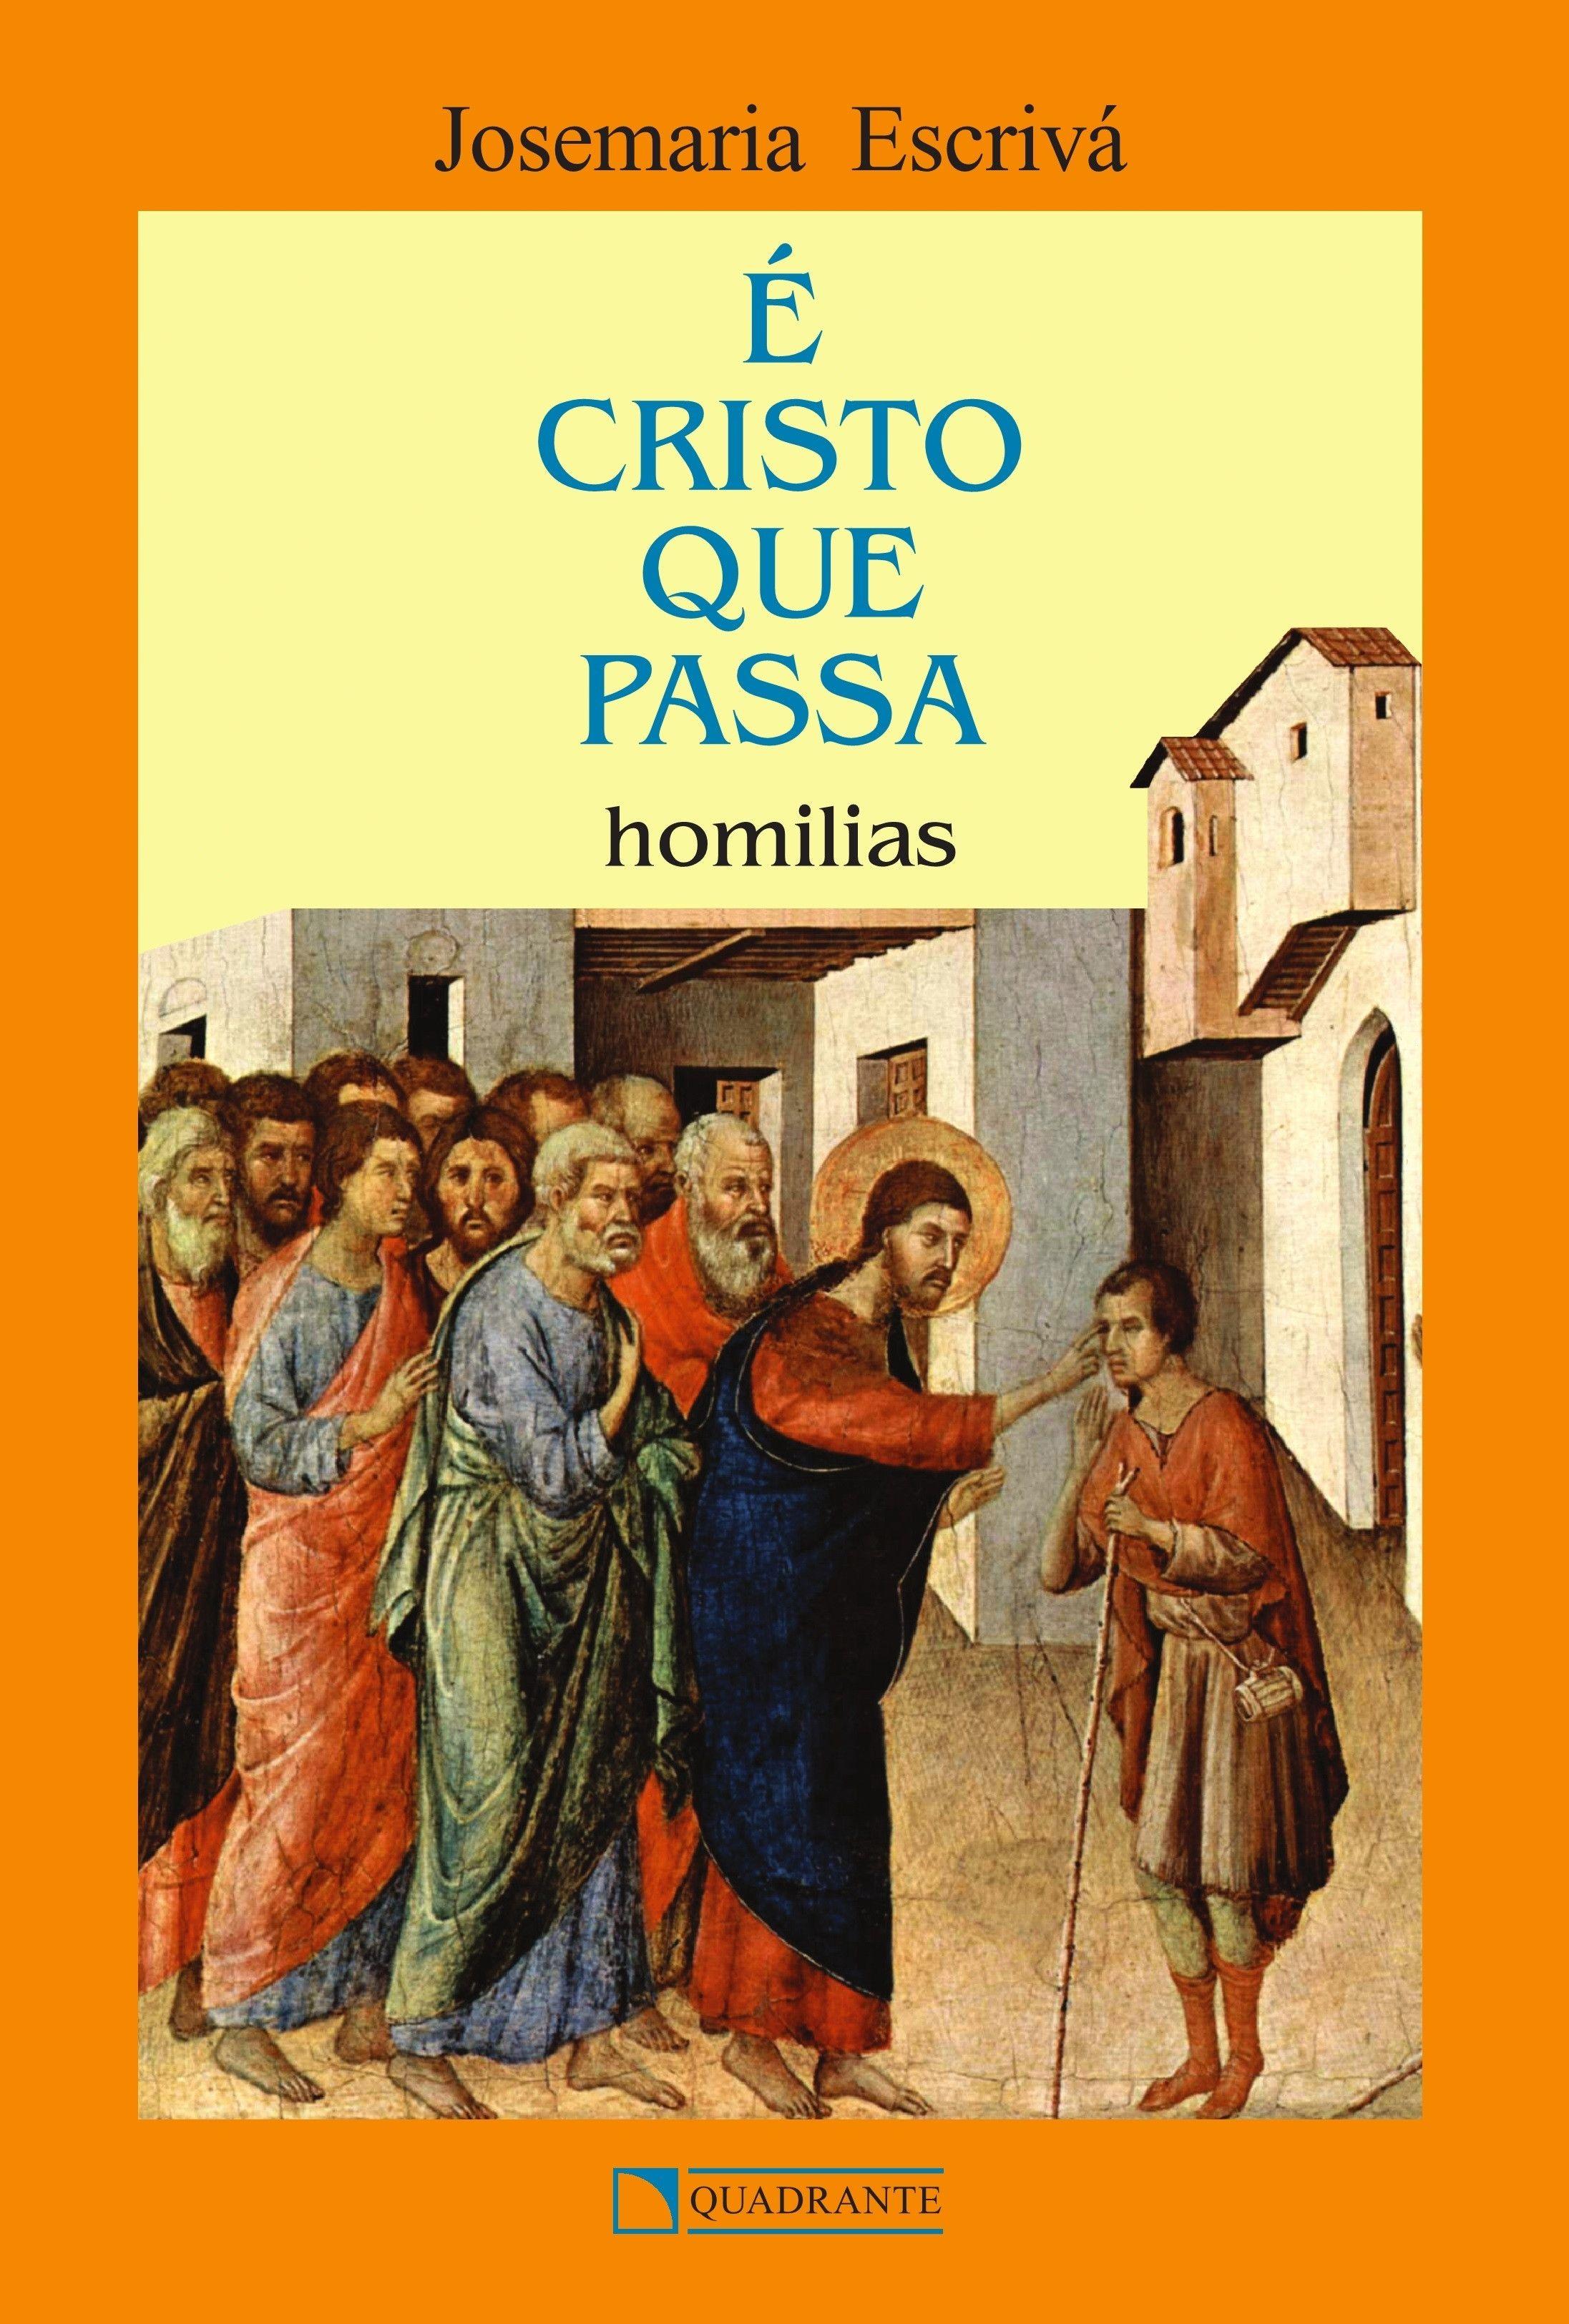 Livro É Cristo que passa